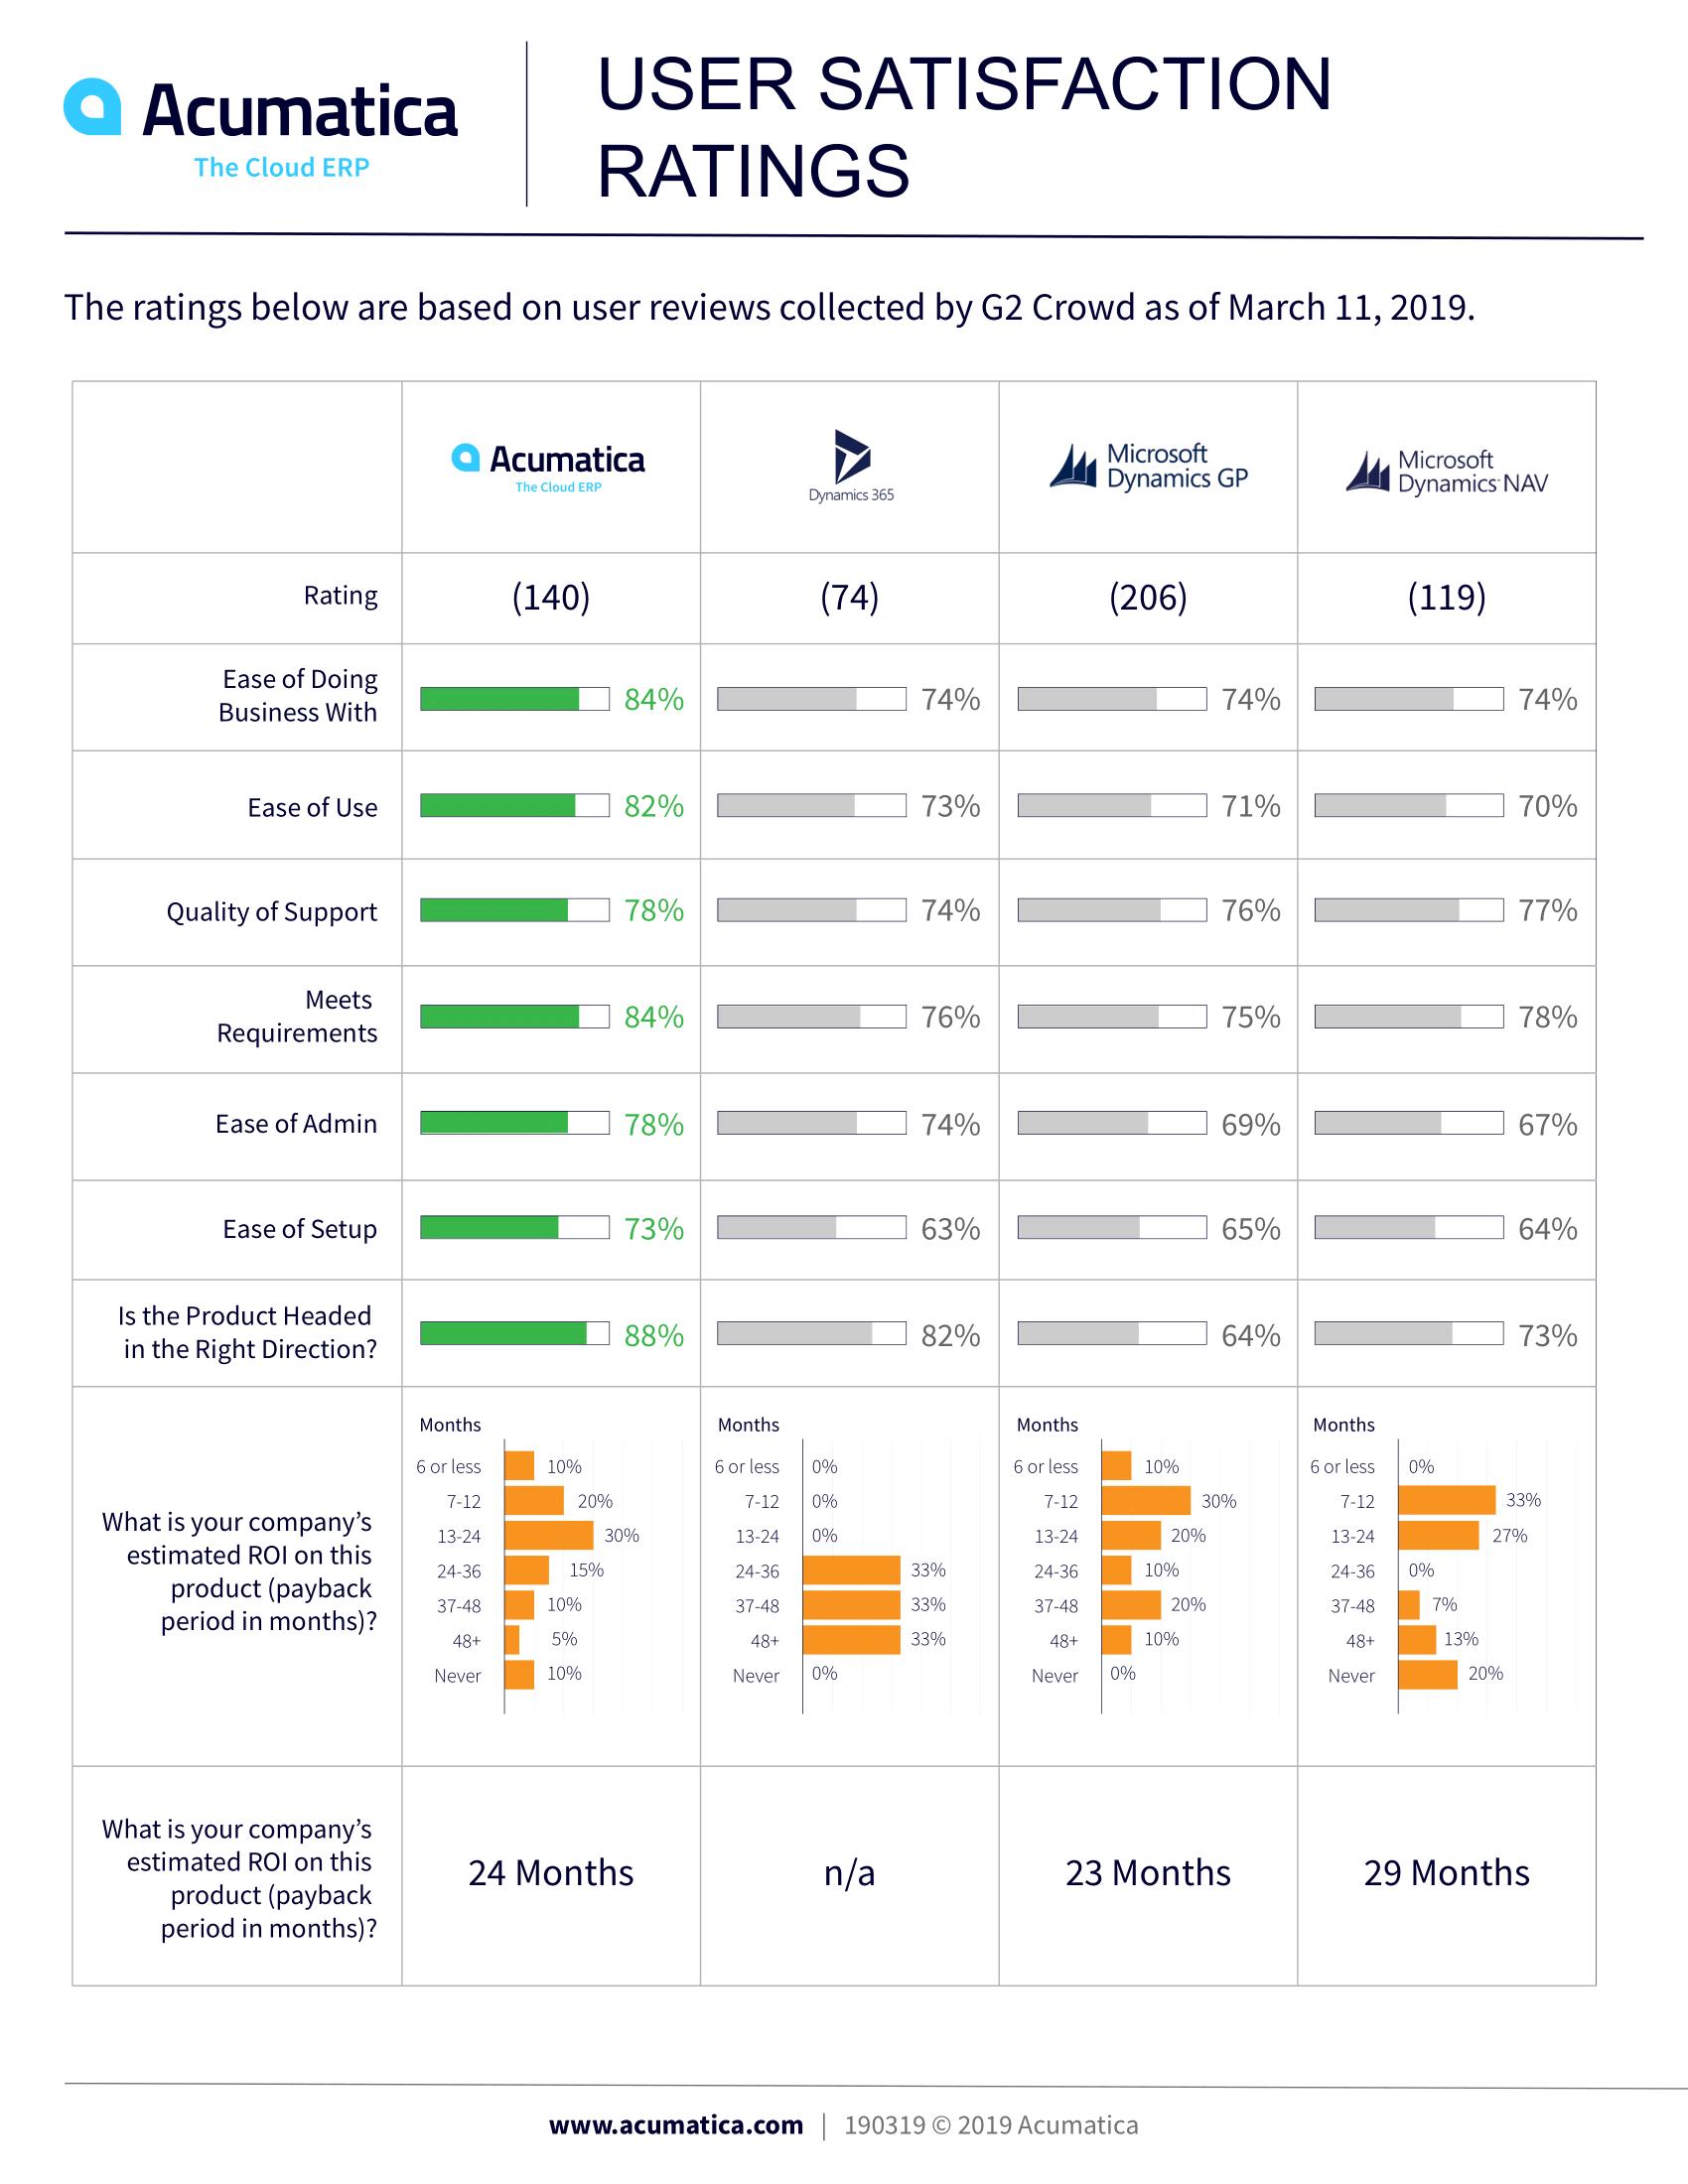 Acumatica Users Satisfaction Ratings